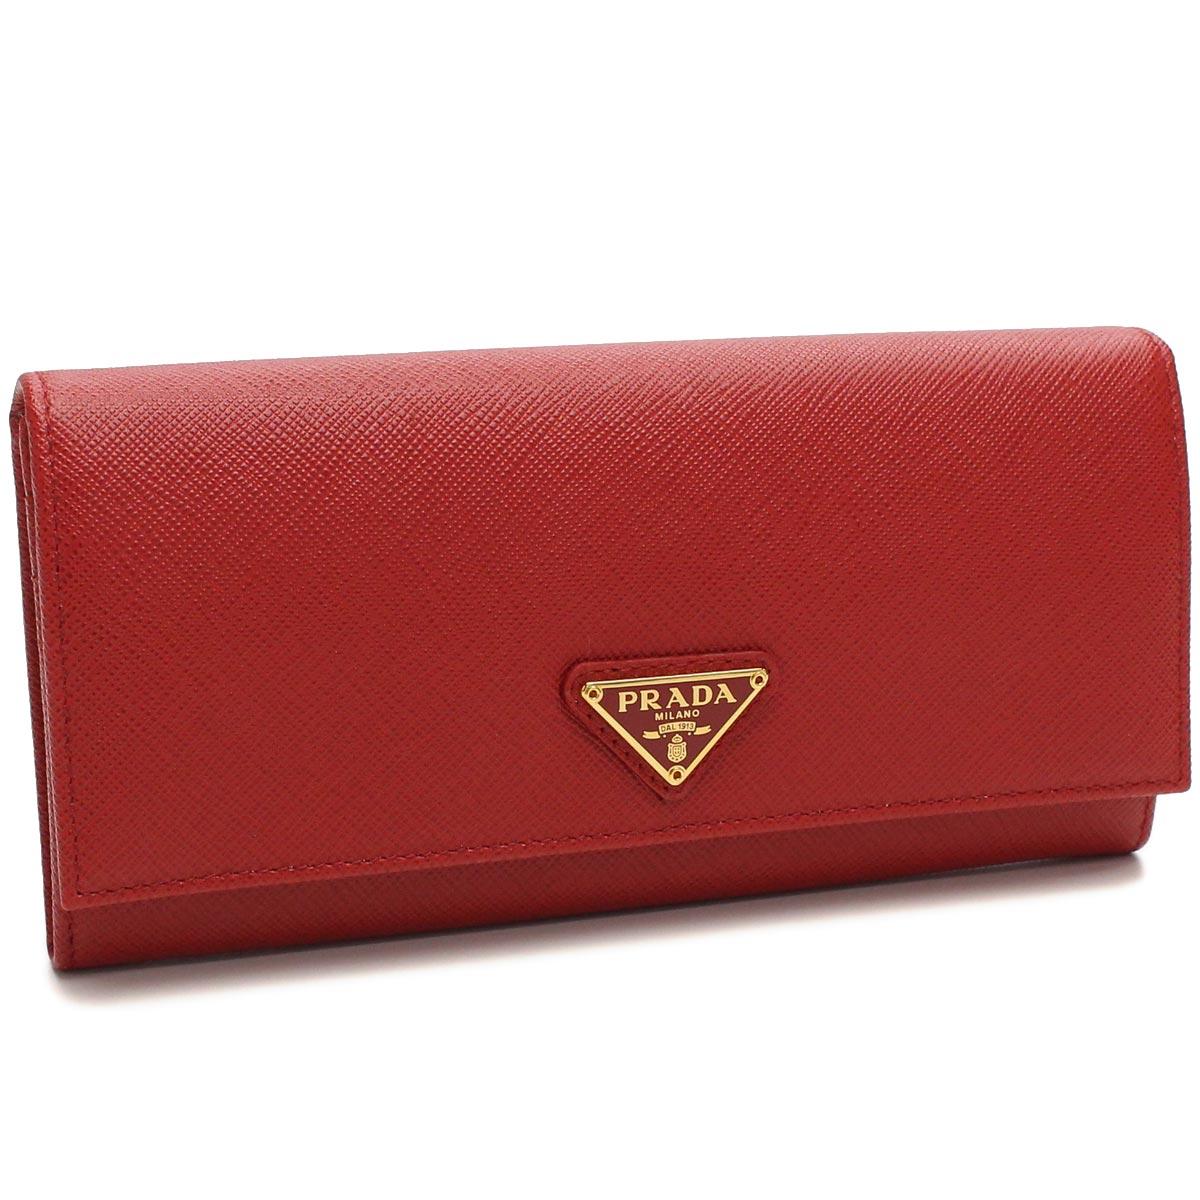 7223cfc8f979a Bighit The total brand wholesale  BI-fold wallet Prada (PRADA) rubx QHH-F068Z  FUOCO red series( taxfree send by EMS authentic A brand new item )